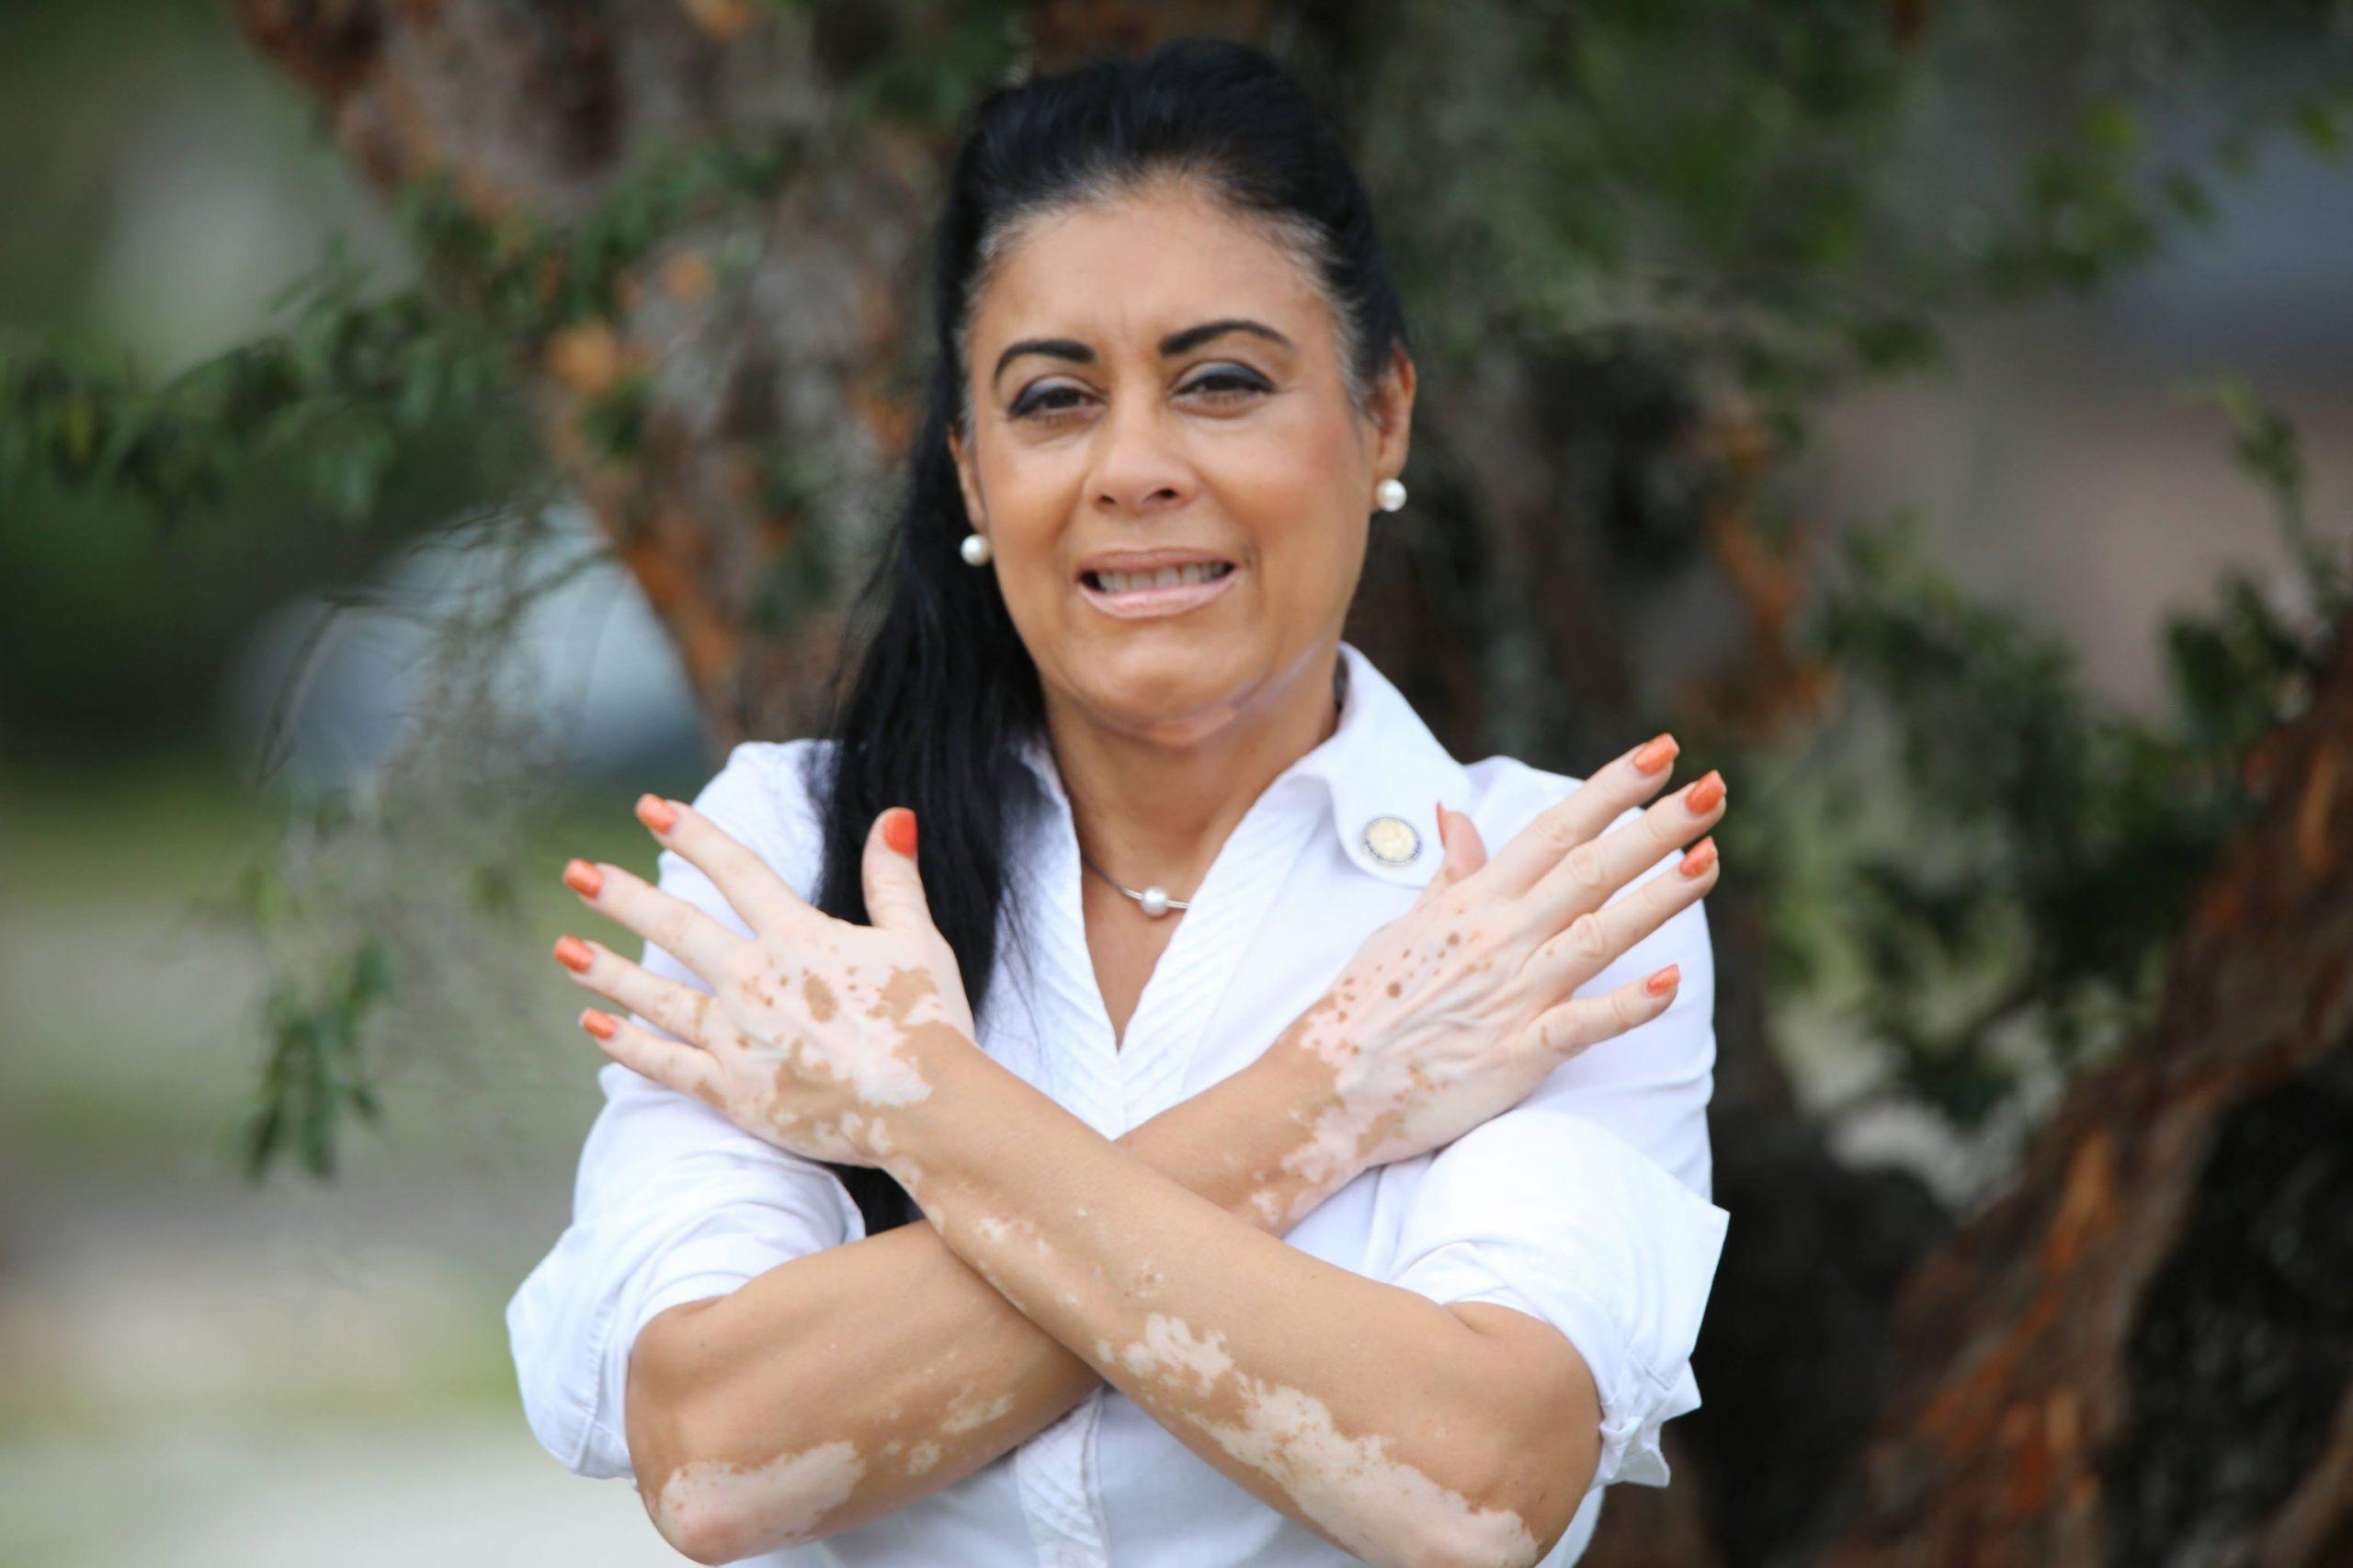 State Rep. Daisy Morales to Host Inaugural World Vitiligo Day Celebration at Orlando City Hall